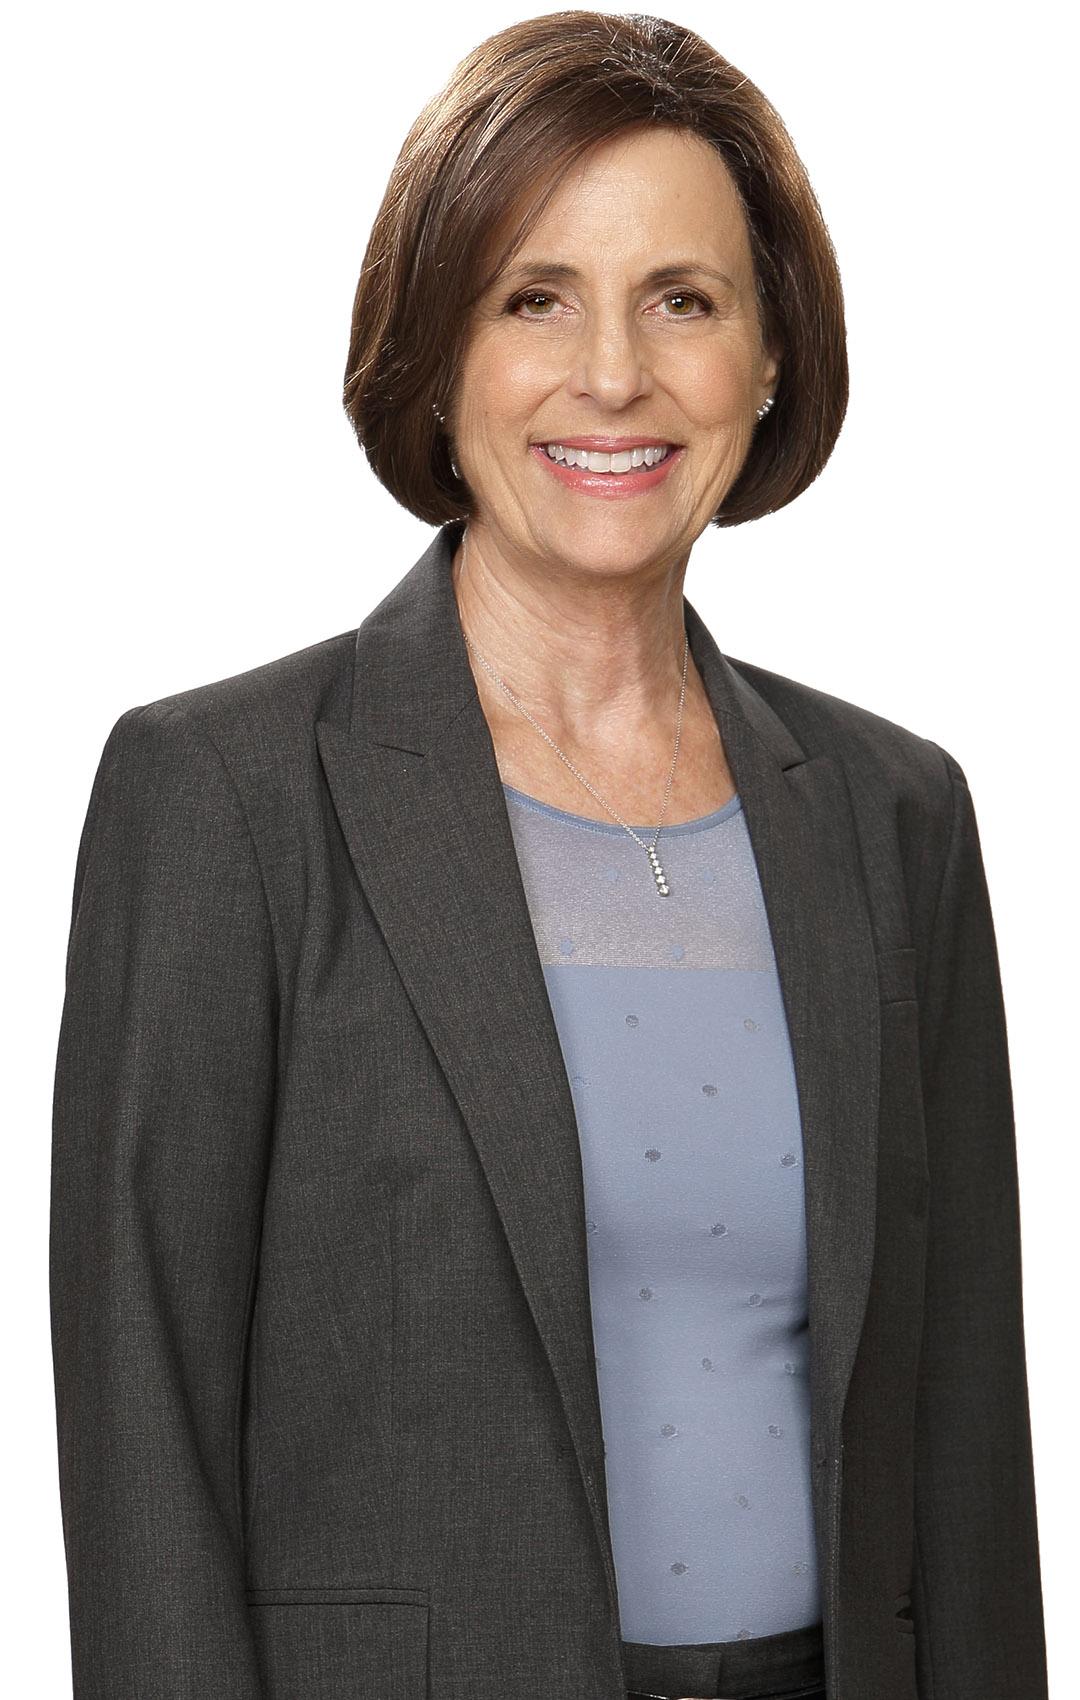 Deborah J. Goldman